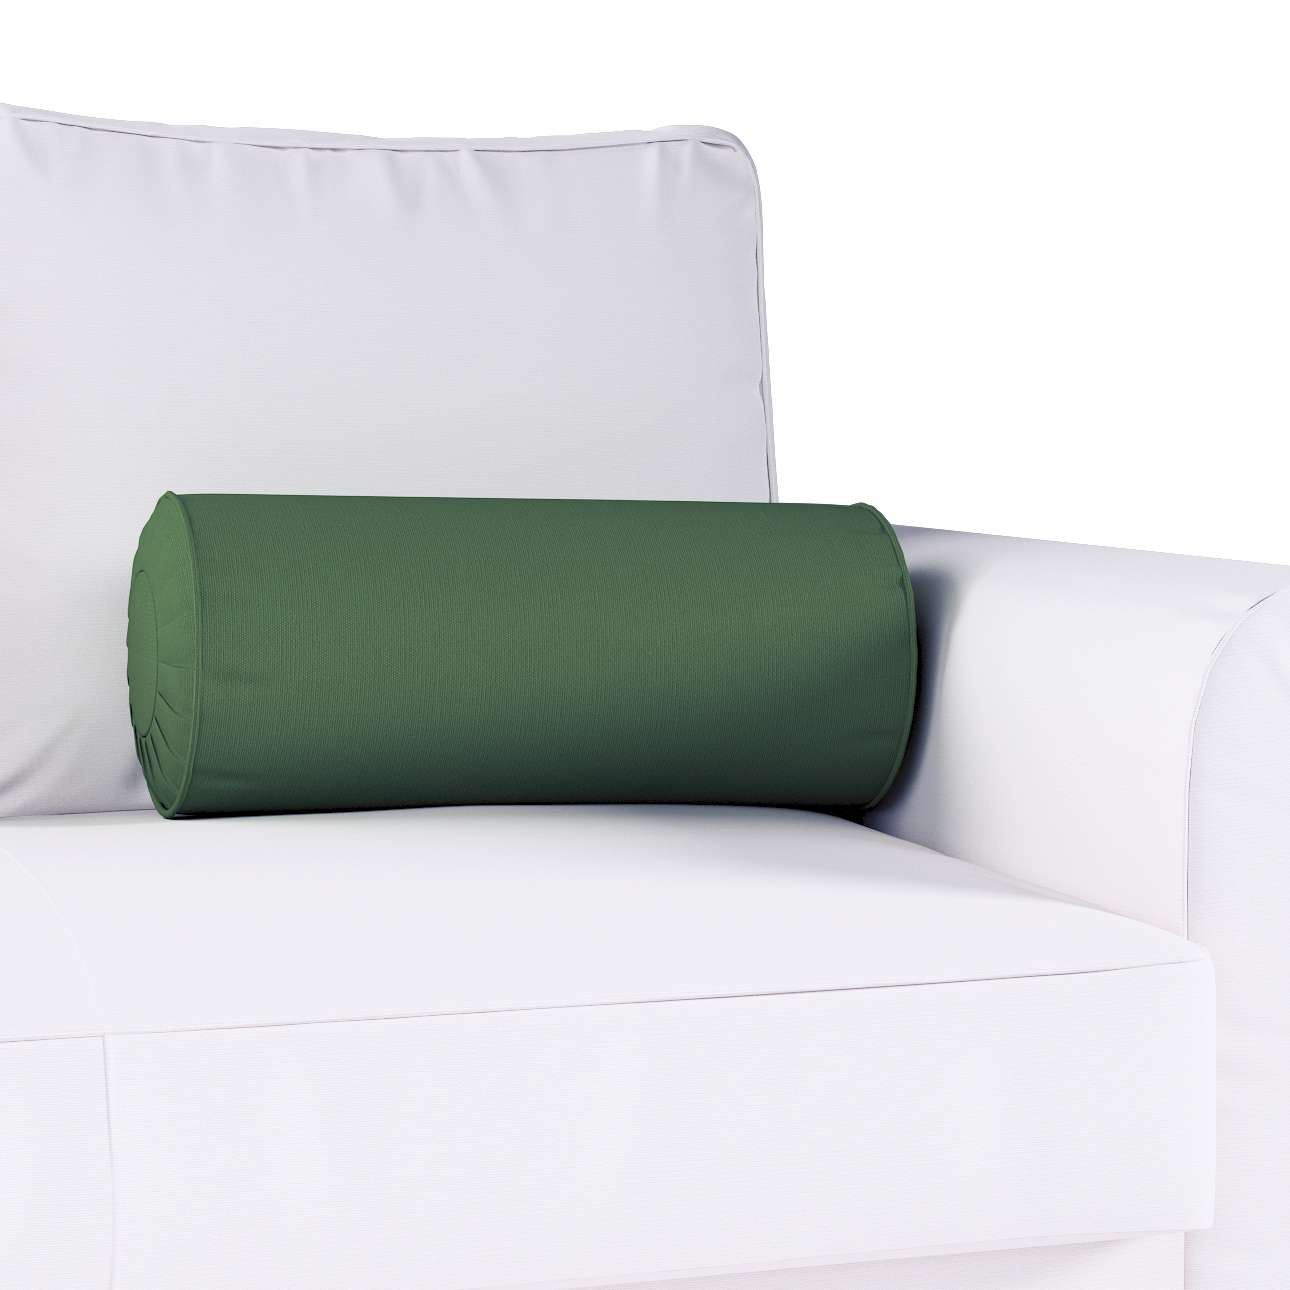 Nakkepude med folder Ø 20 × 50 cm fra kollektionen Cotton Panama, Stof: 702-06